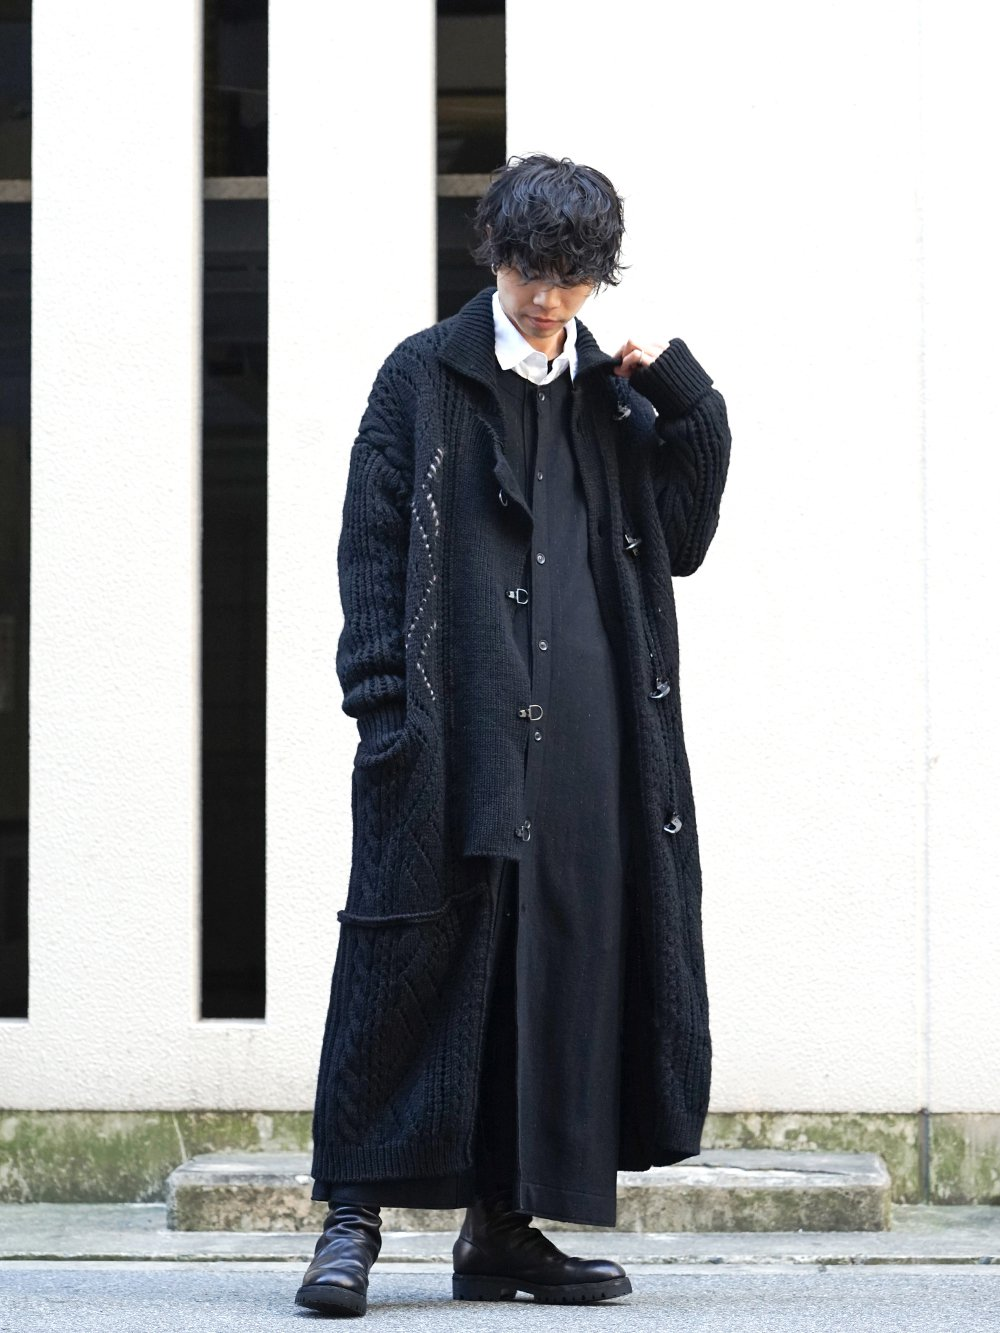 Yohji Yamamoto 19-20AW No Collar Long Cardigan Layered Style - 1-001